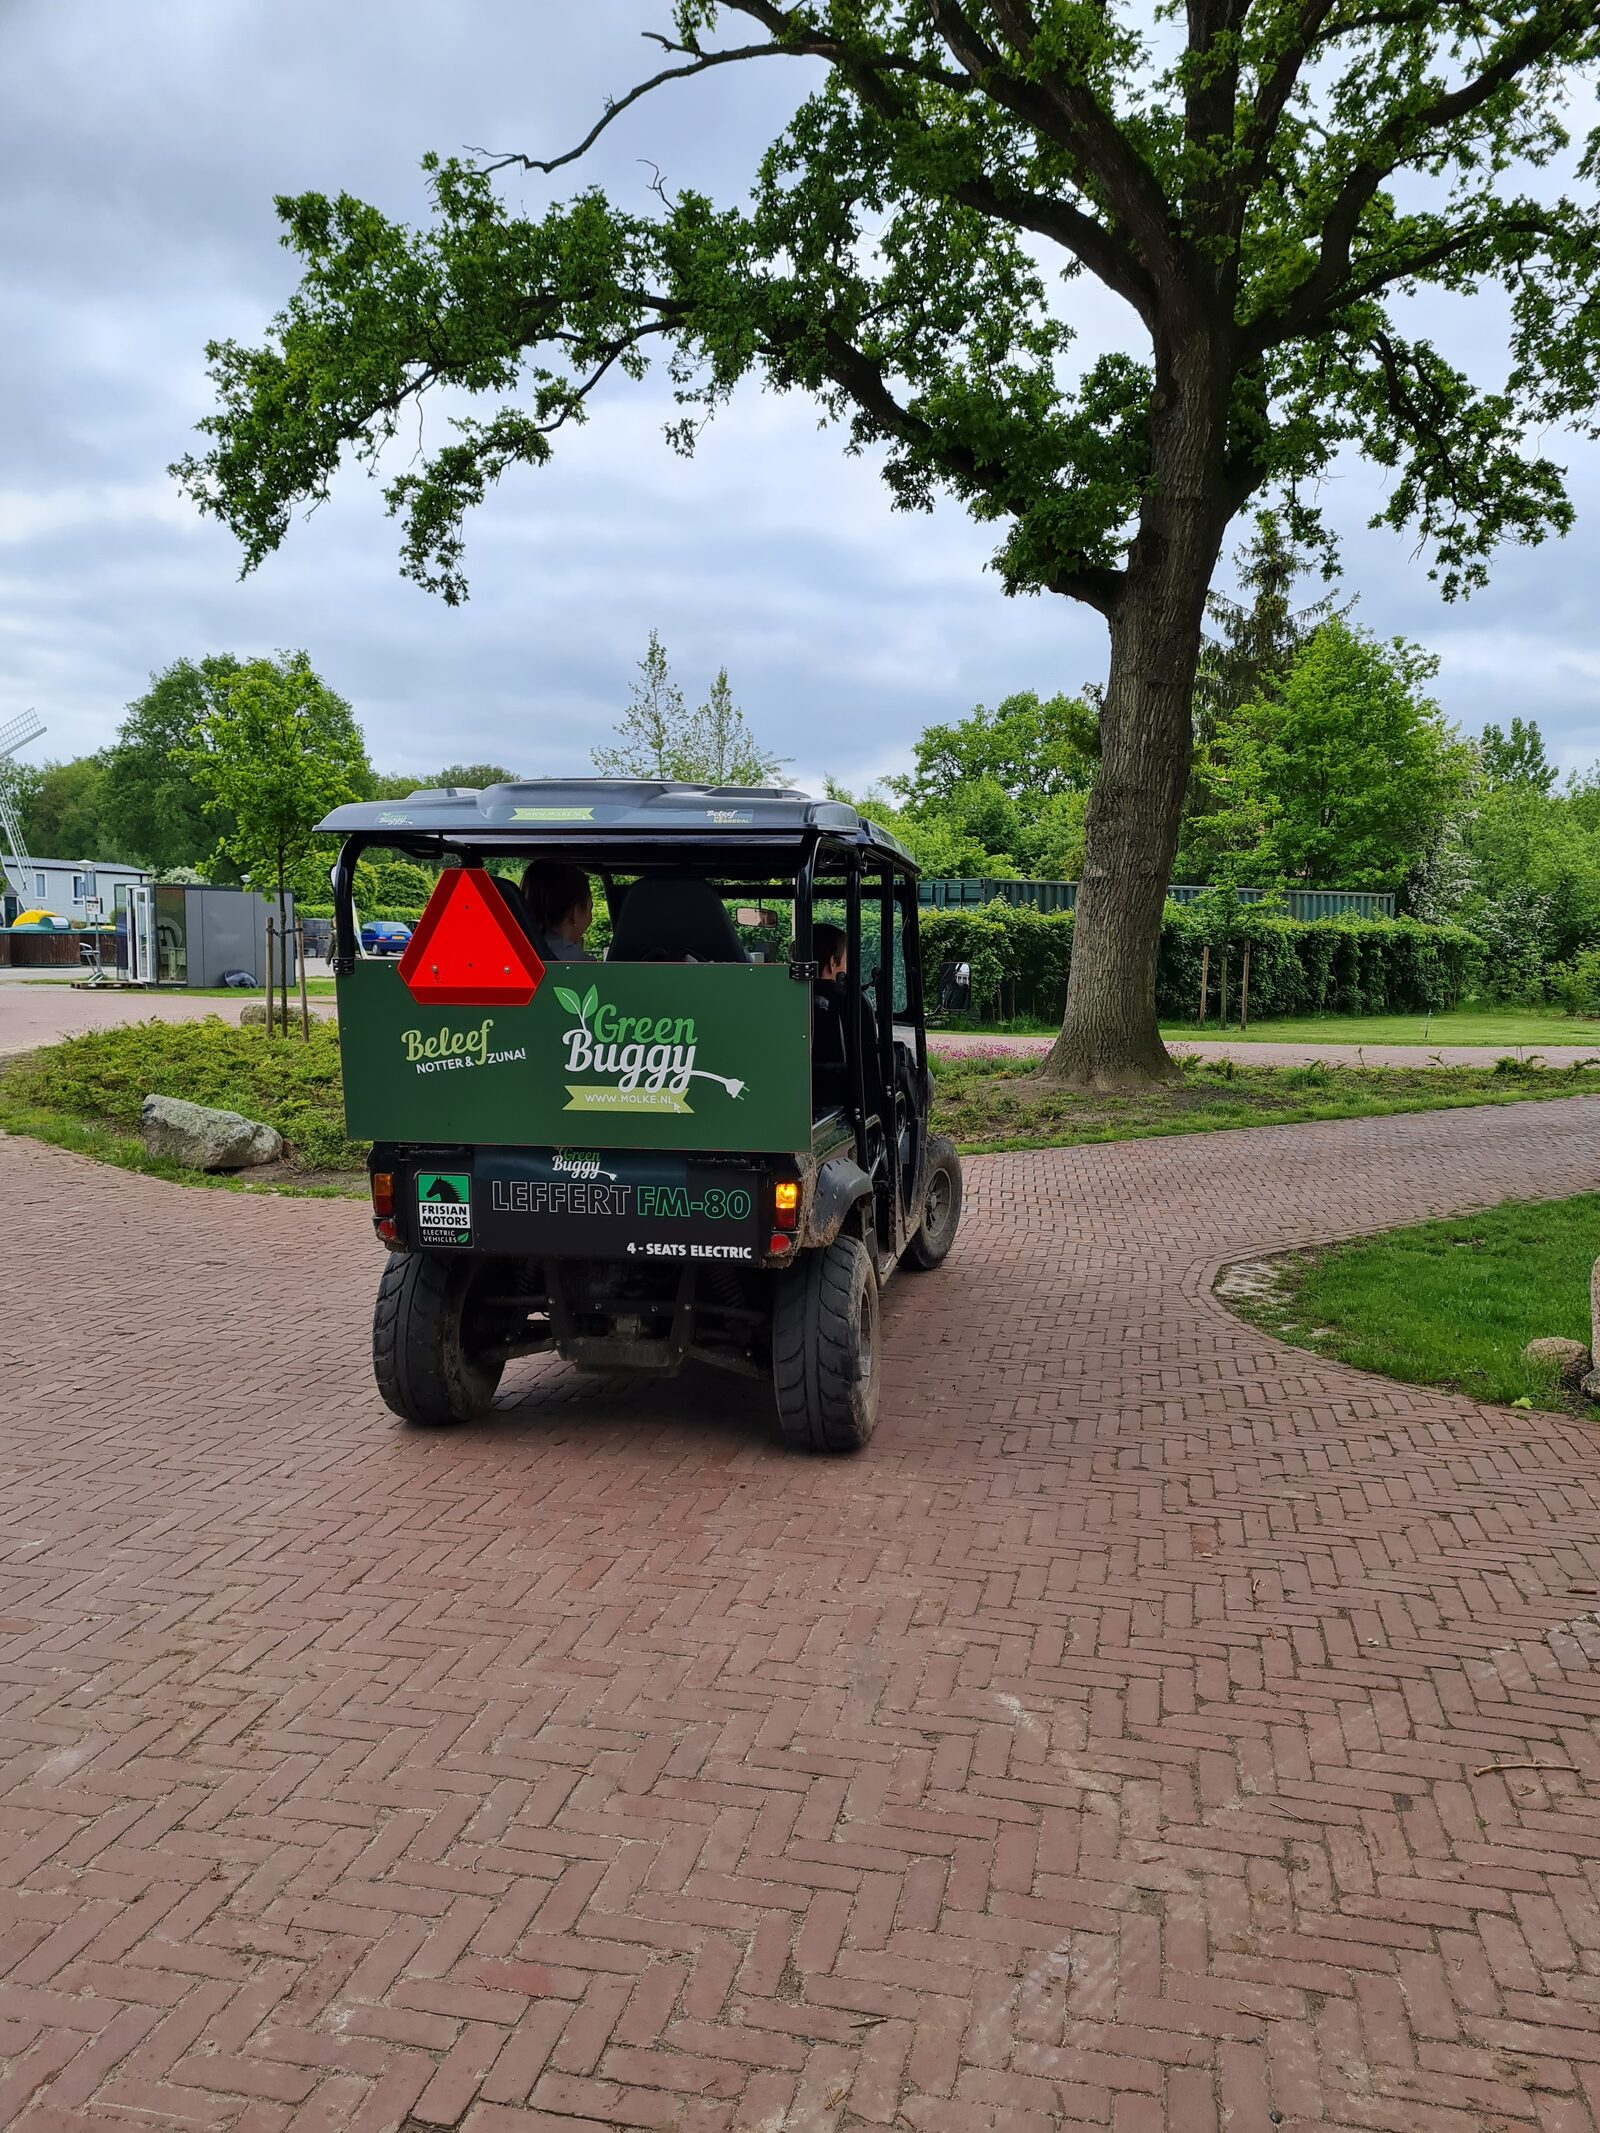 Green buggy